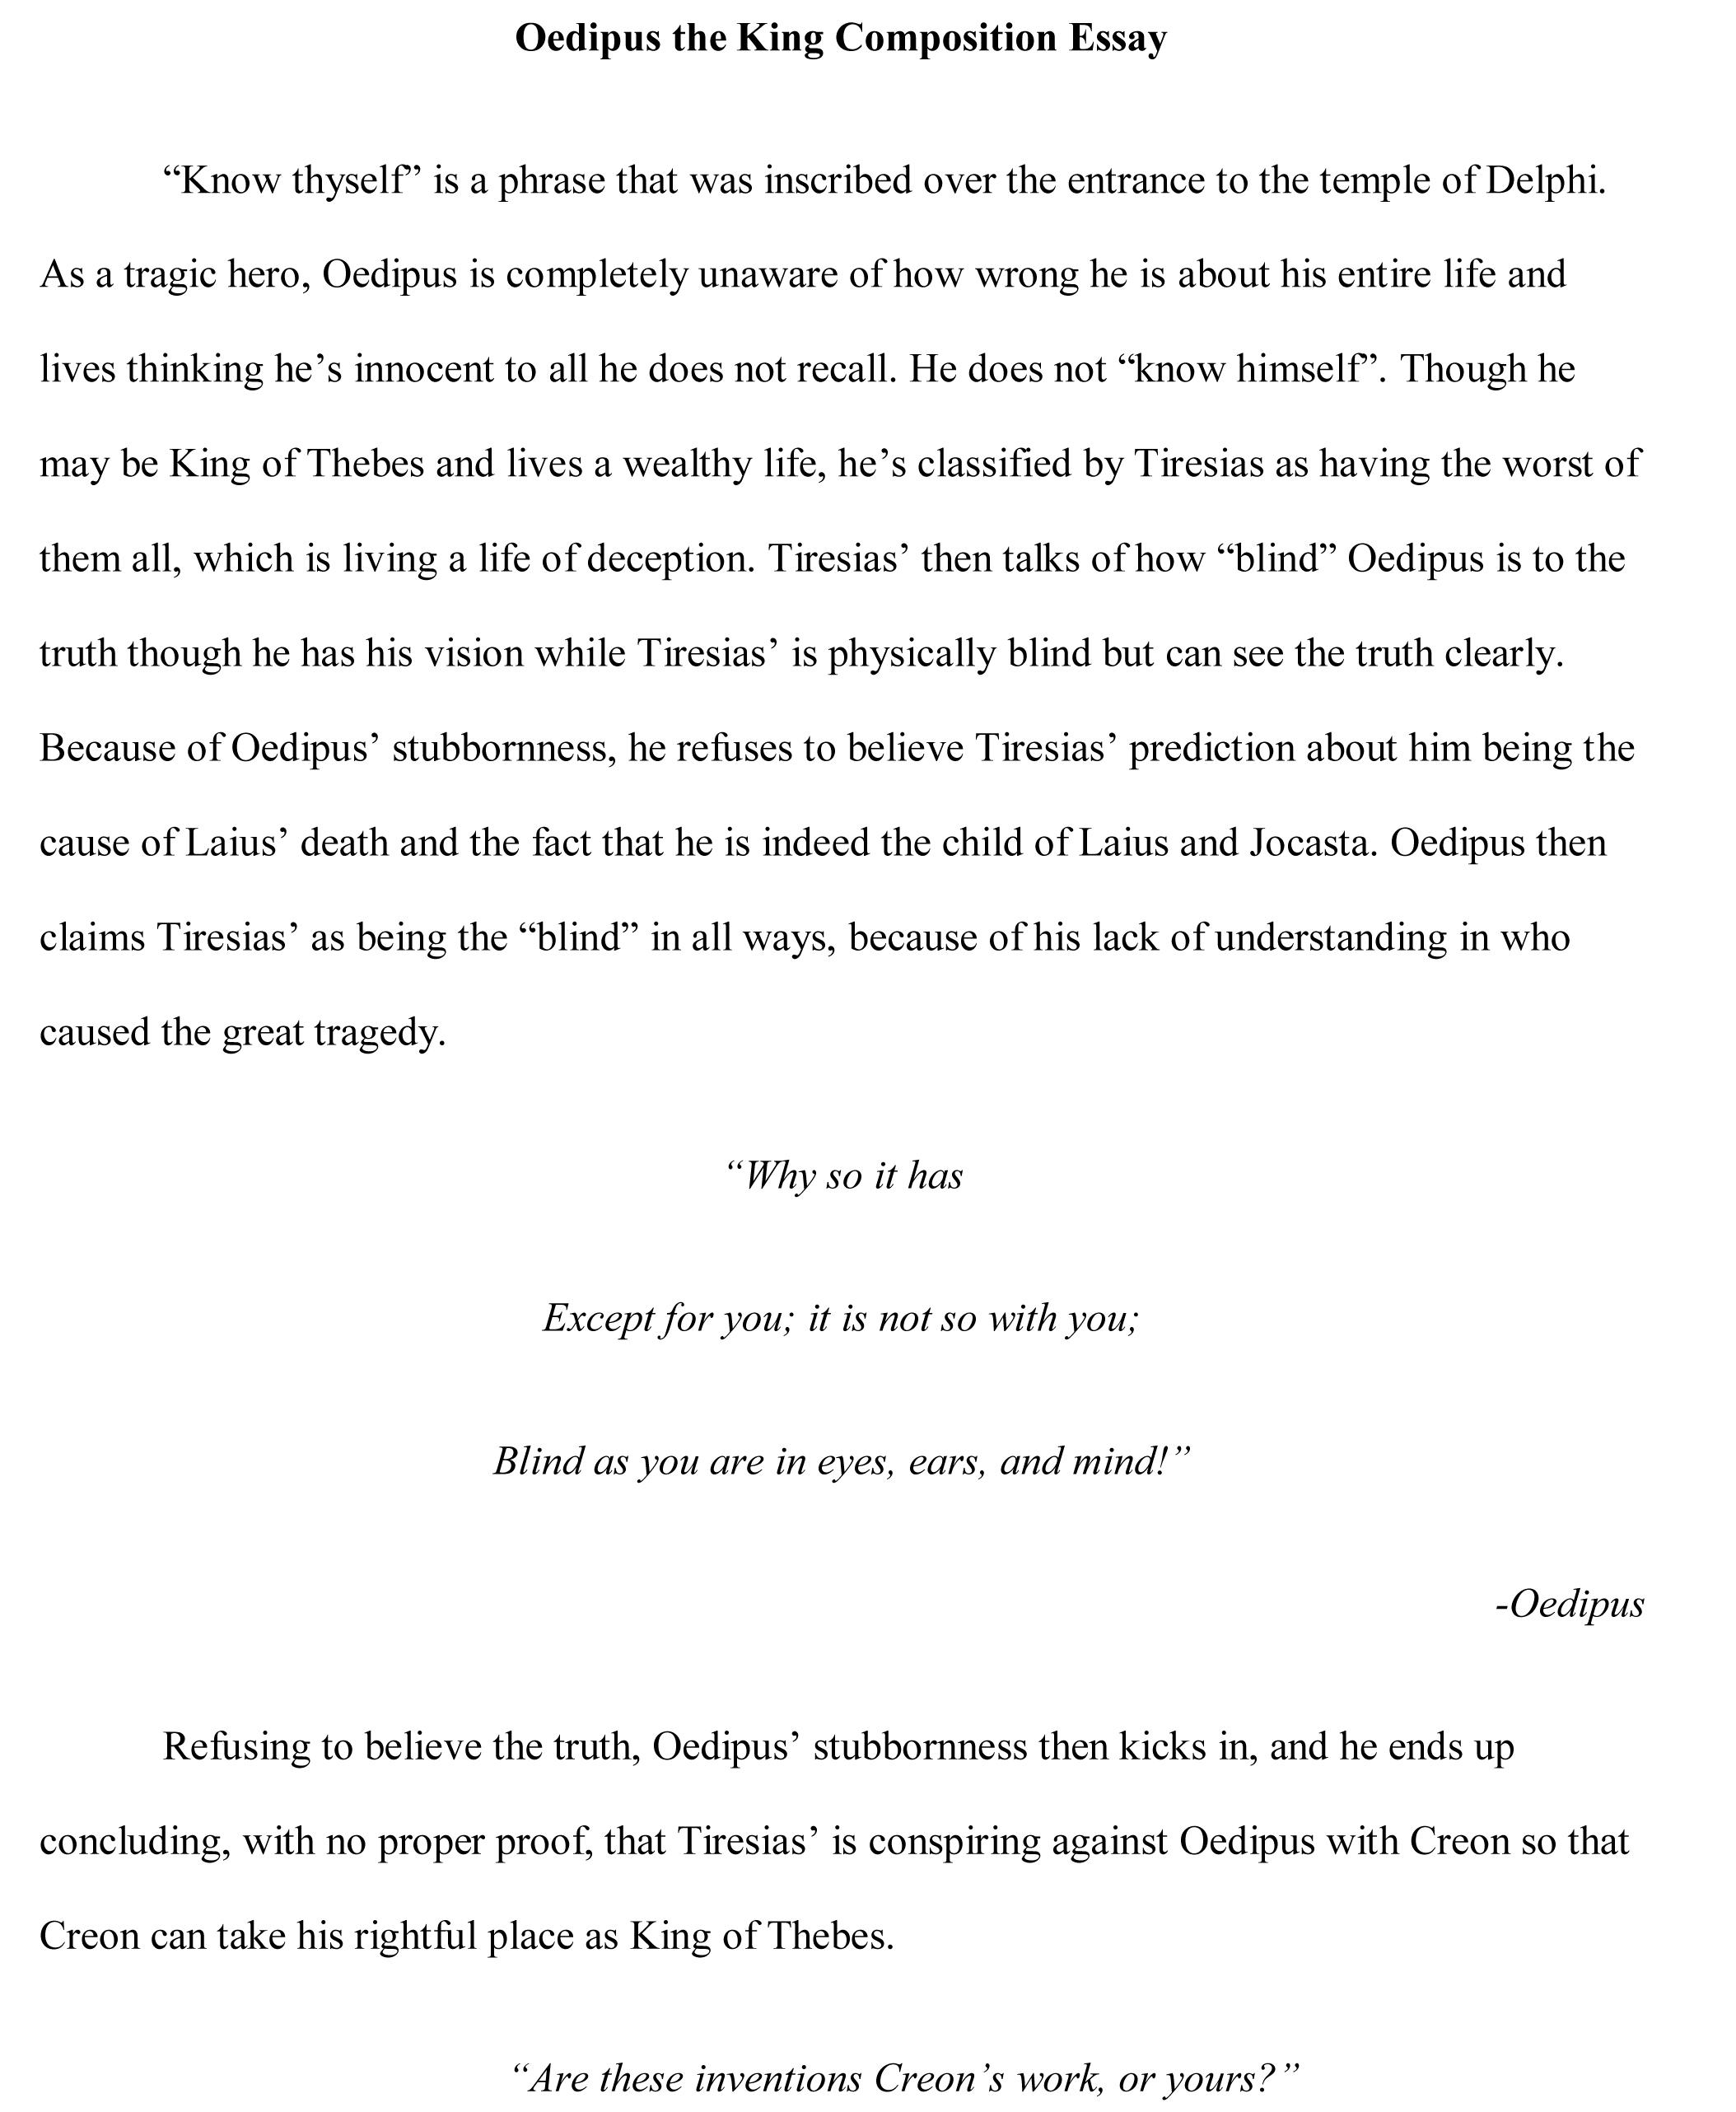 003 Essay Example Oedipus Free Sample Automatic Singular Grader Full